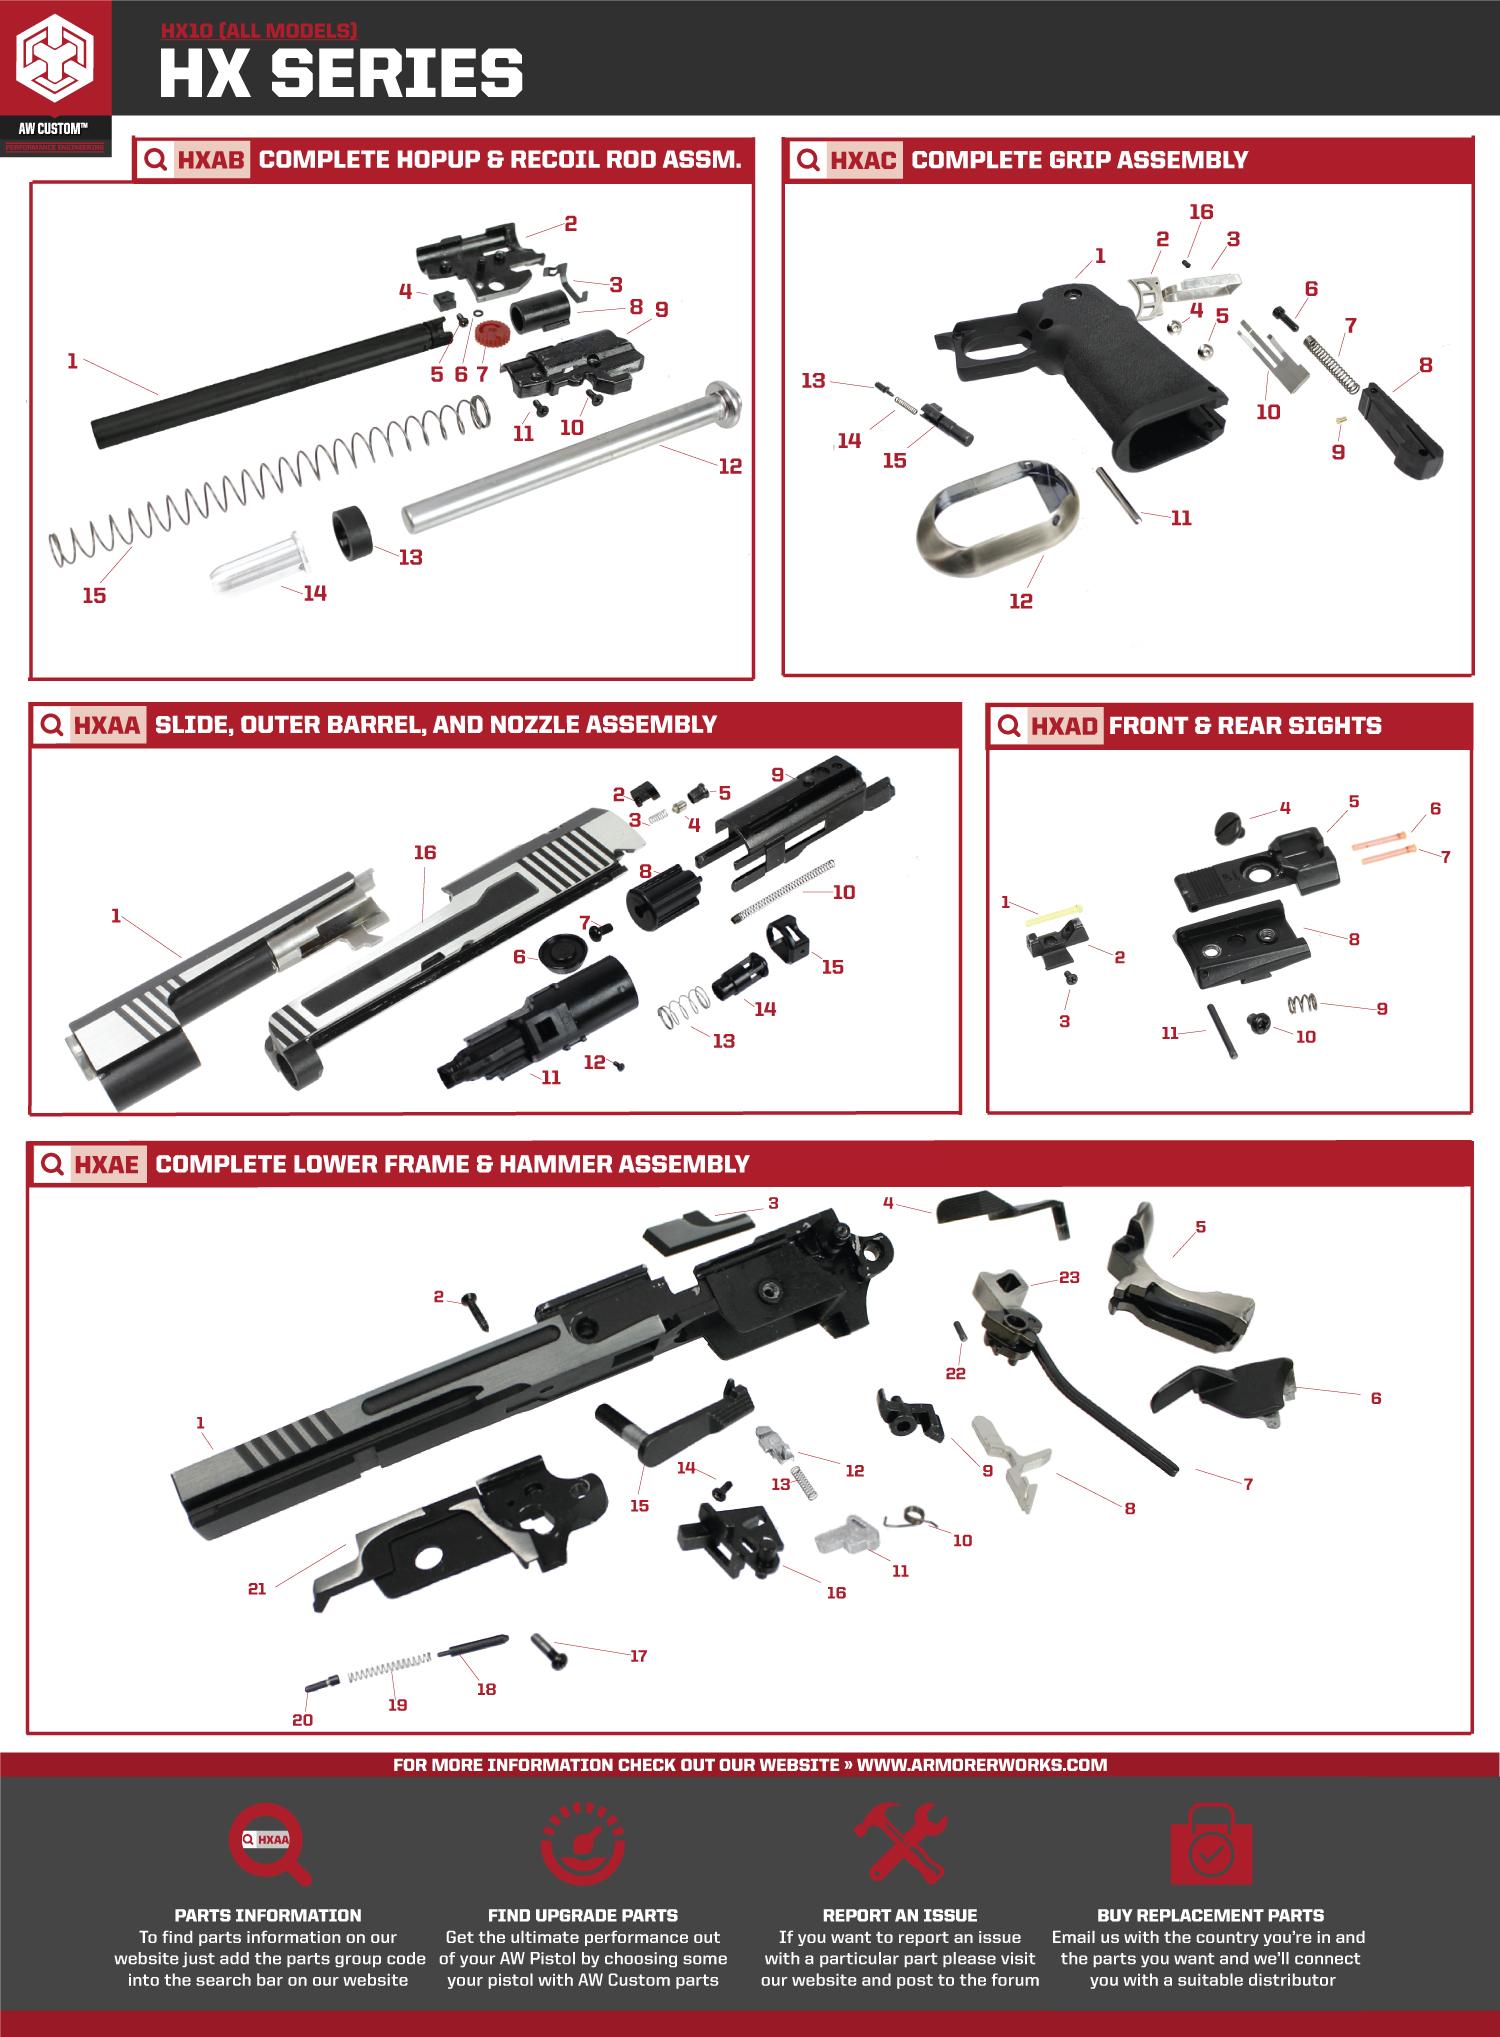 HX10 Parts Diagram on